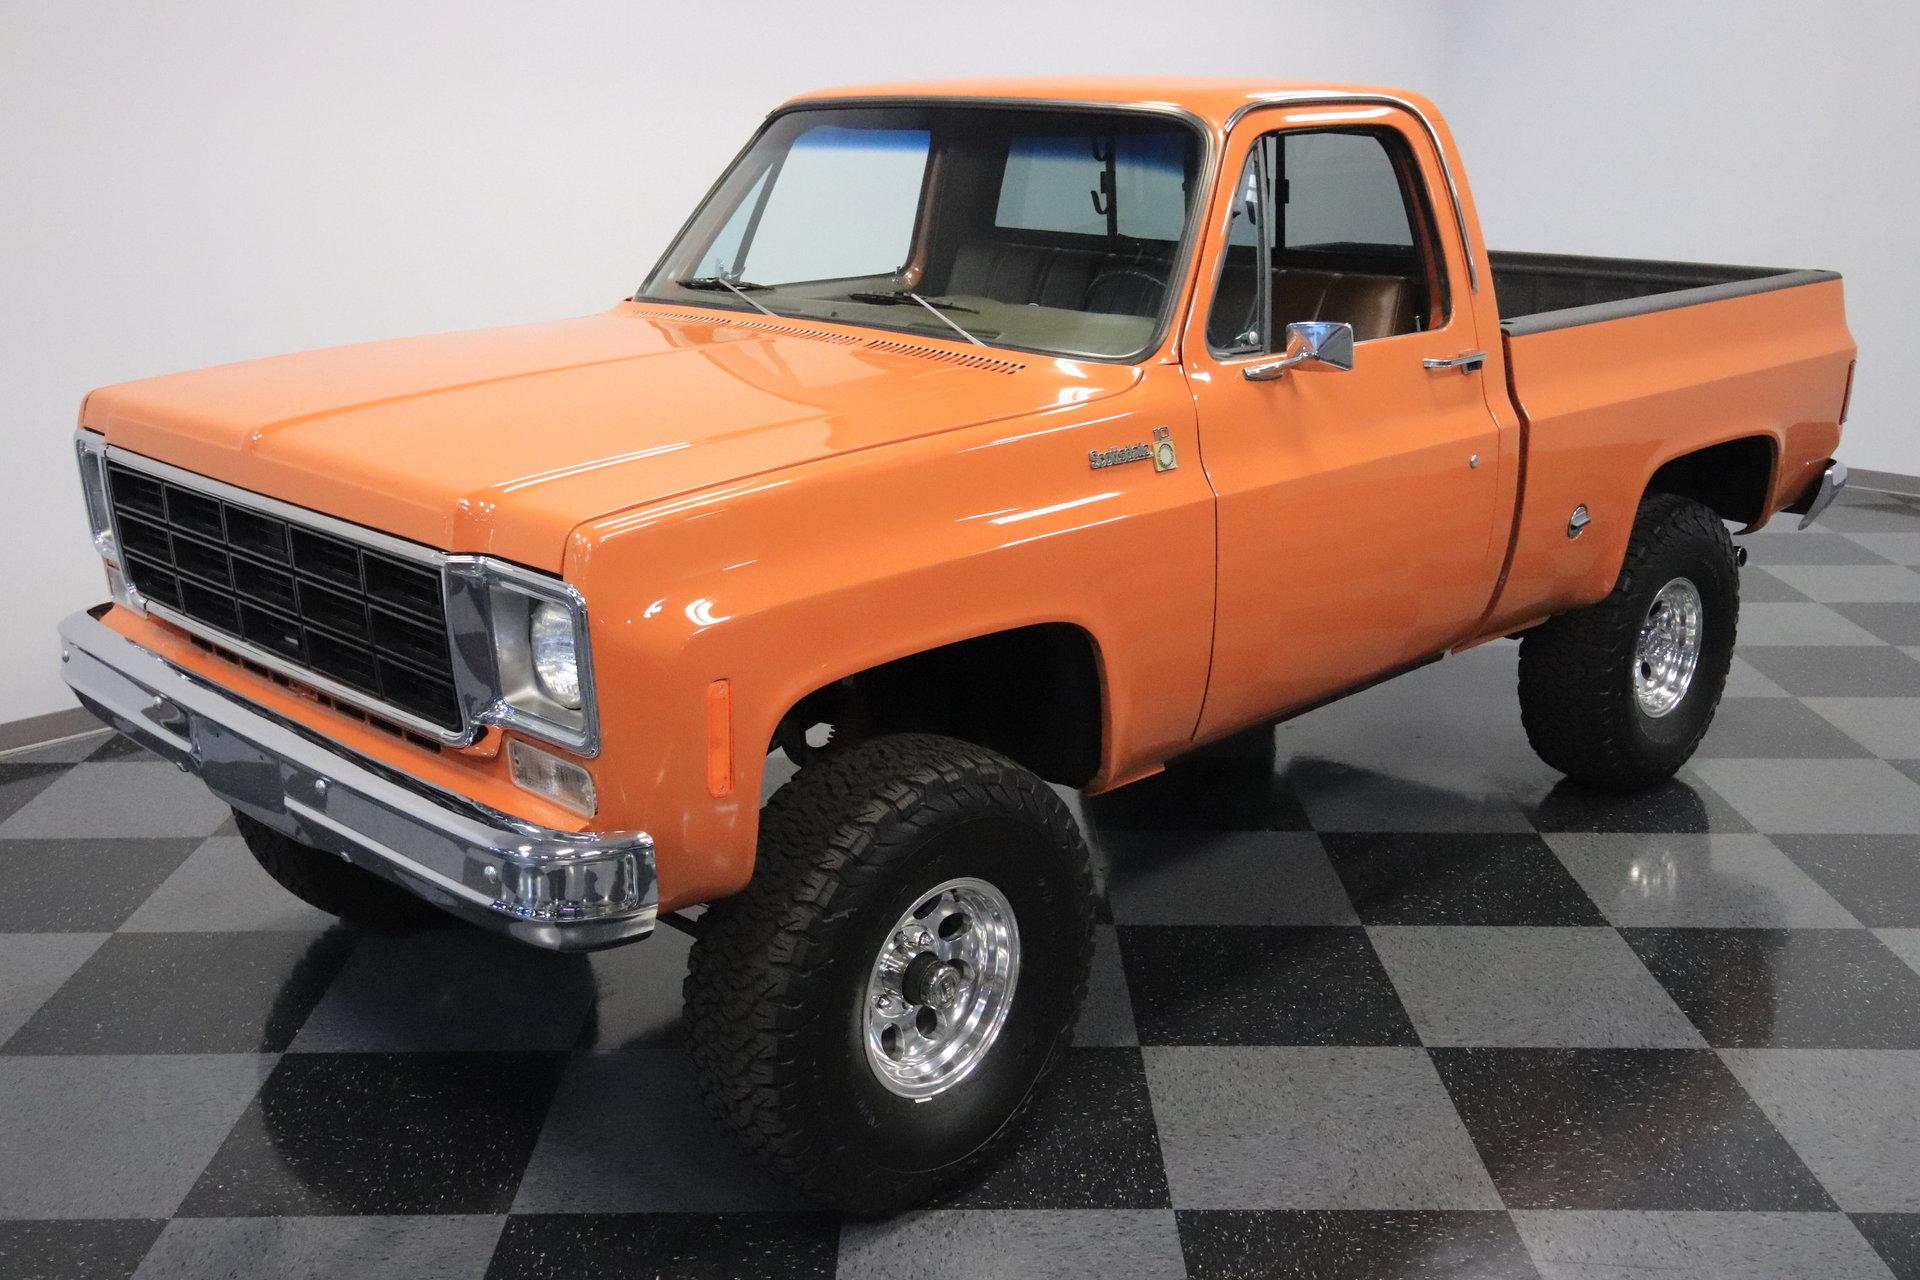 1976 Chevrolet K 10 Scottsdale 4x4 For Sale 94925 Mcg Chevy Truck